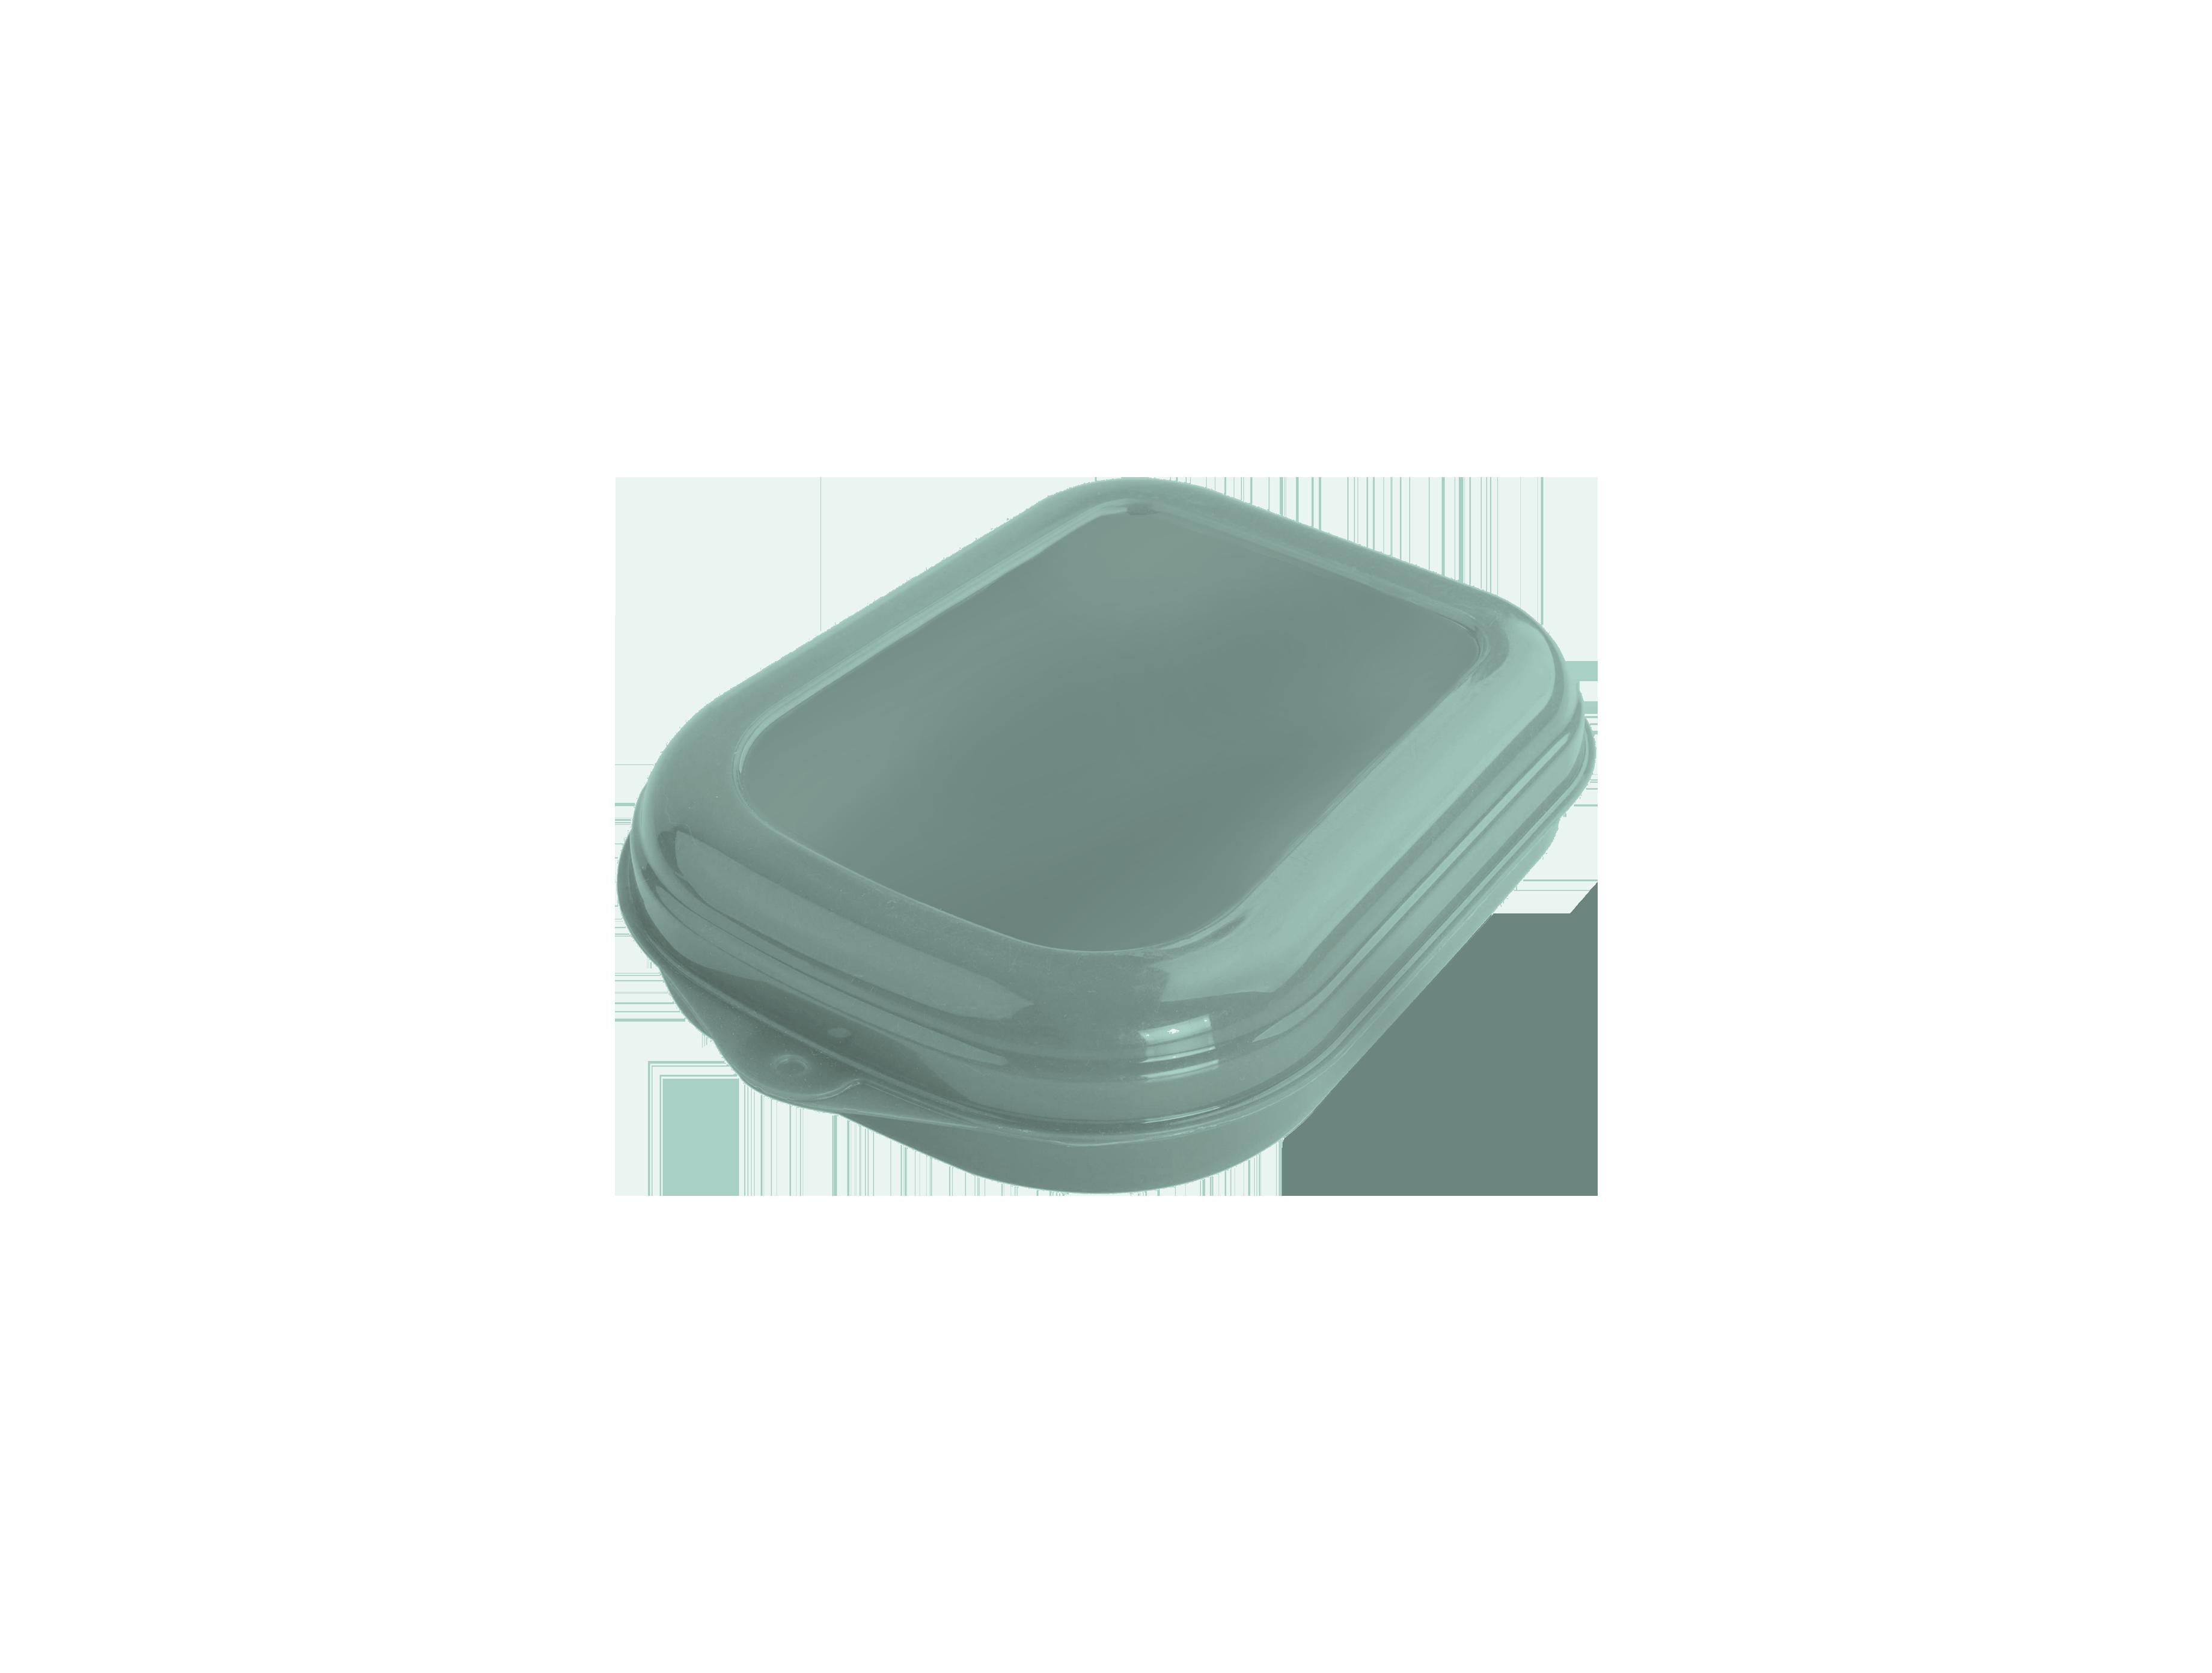 Imagem do produto Sanduicheira